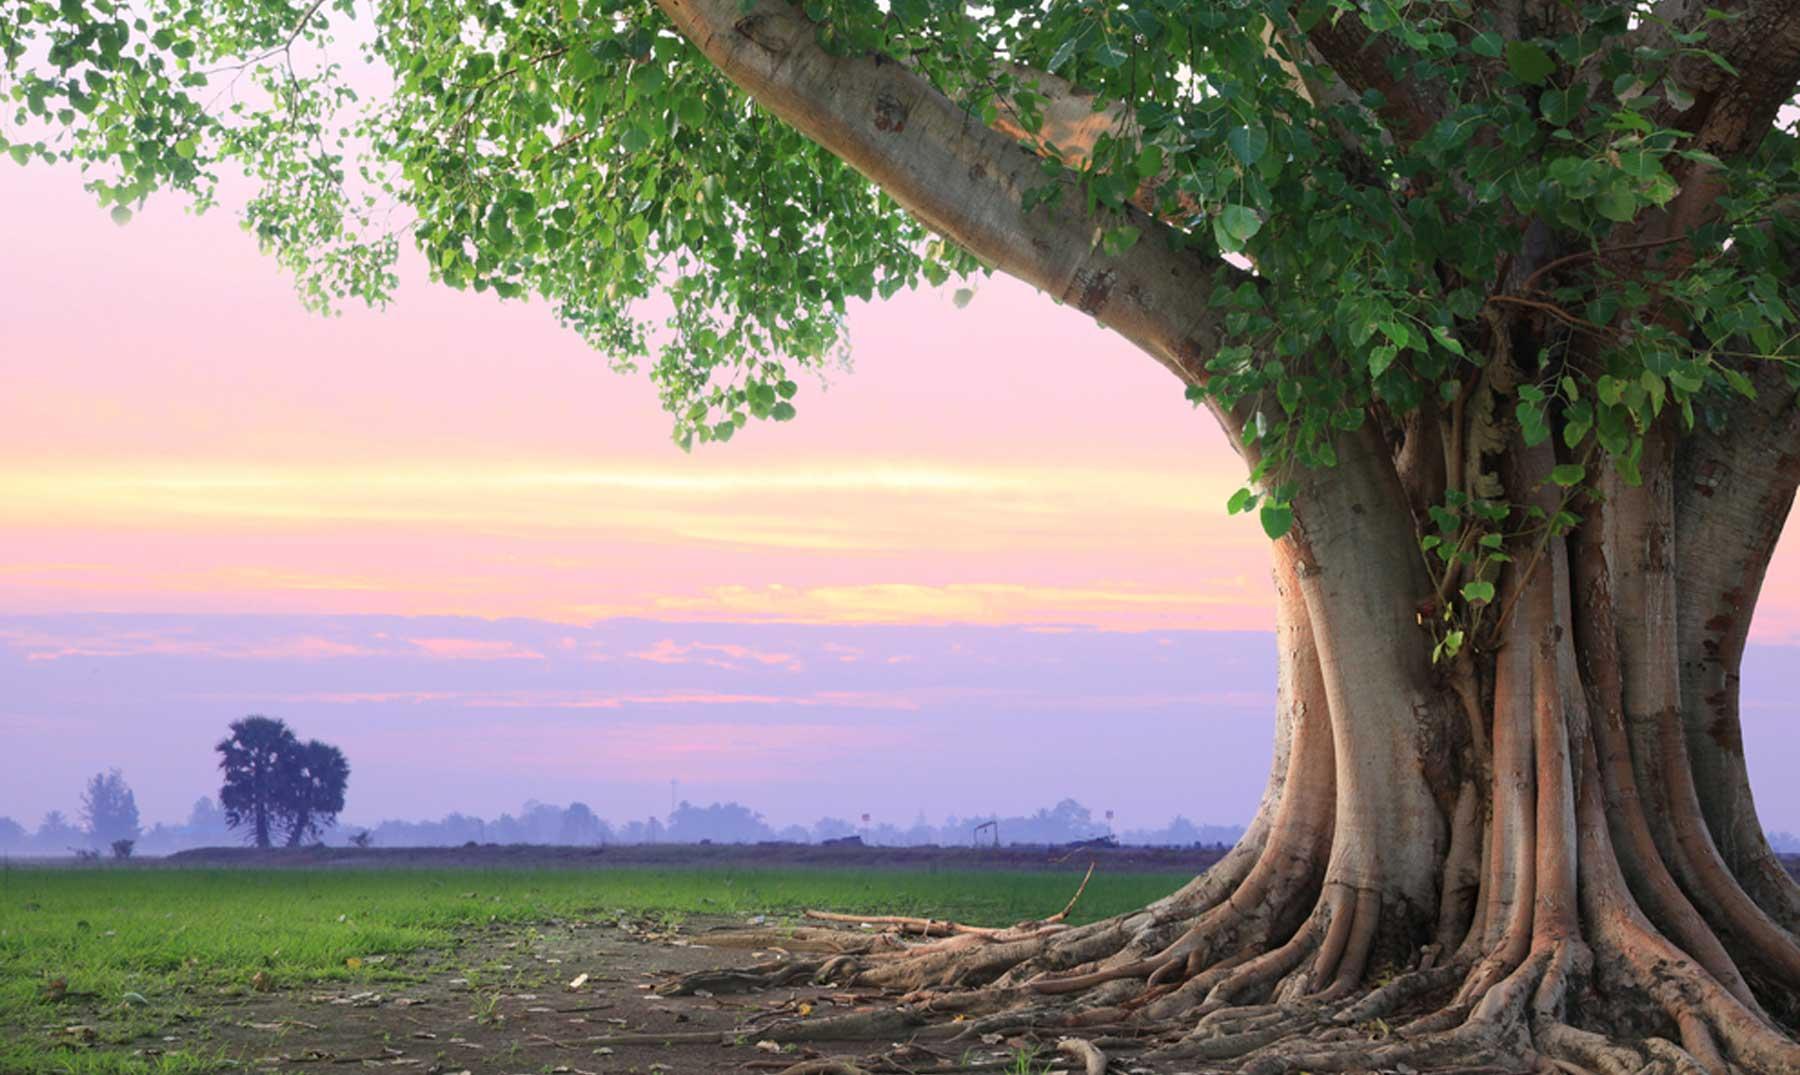 Frases De árboles Frases Sobre árboles Frases De La Vida